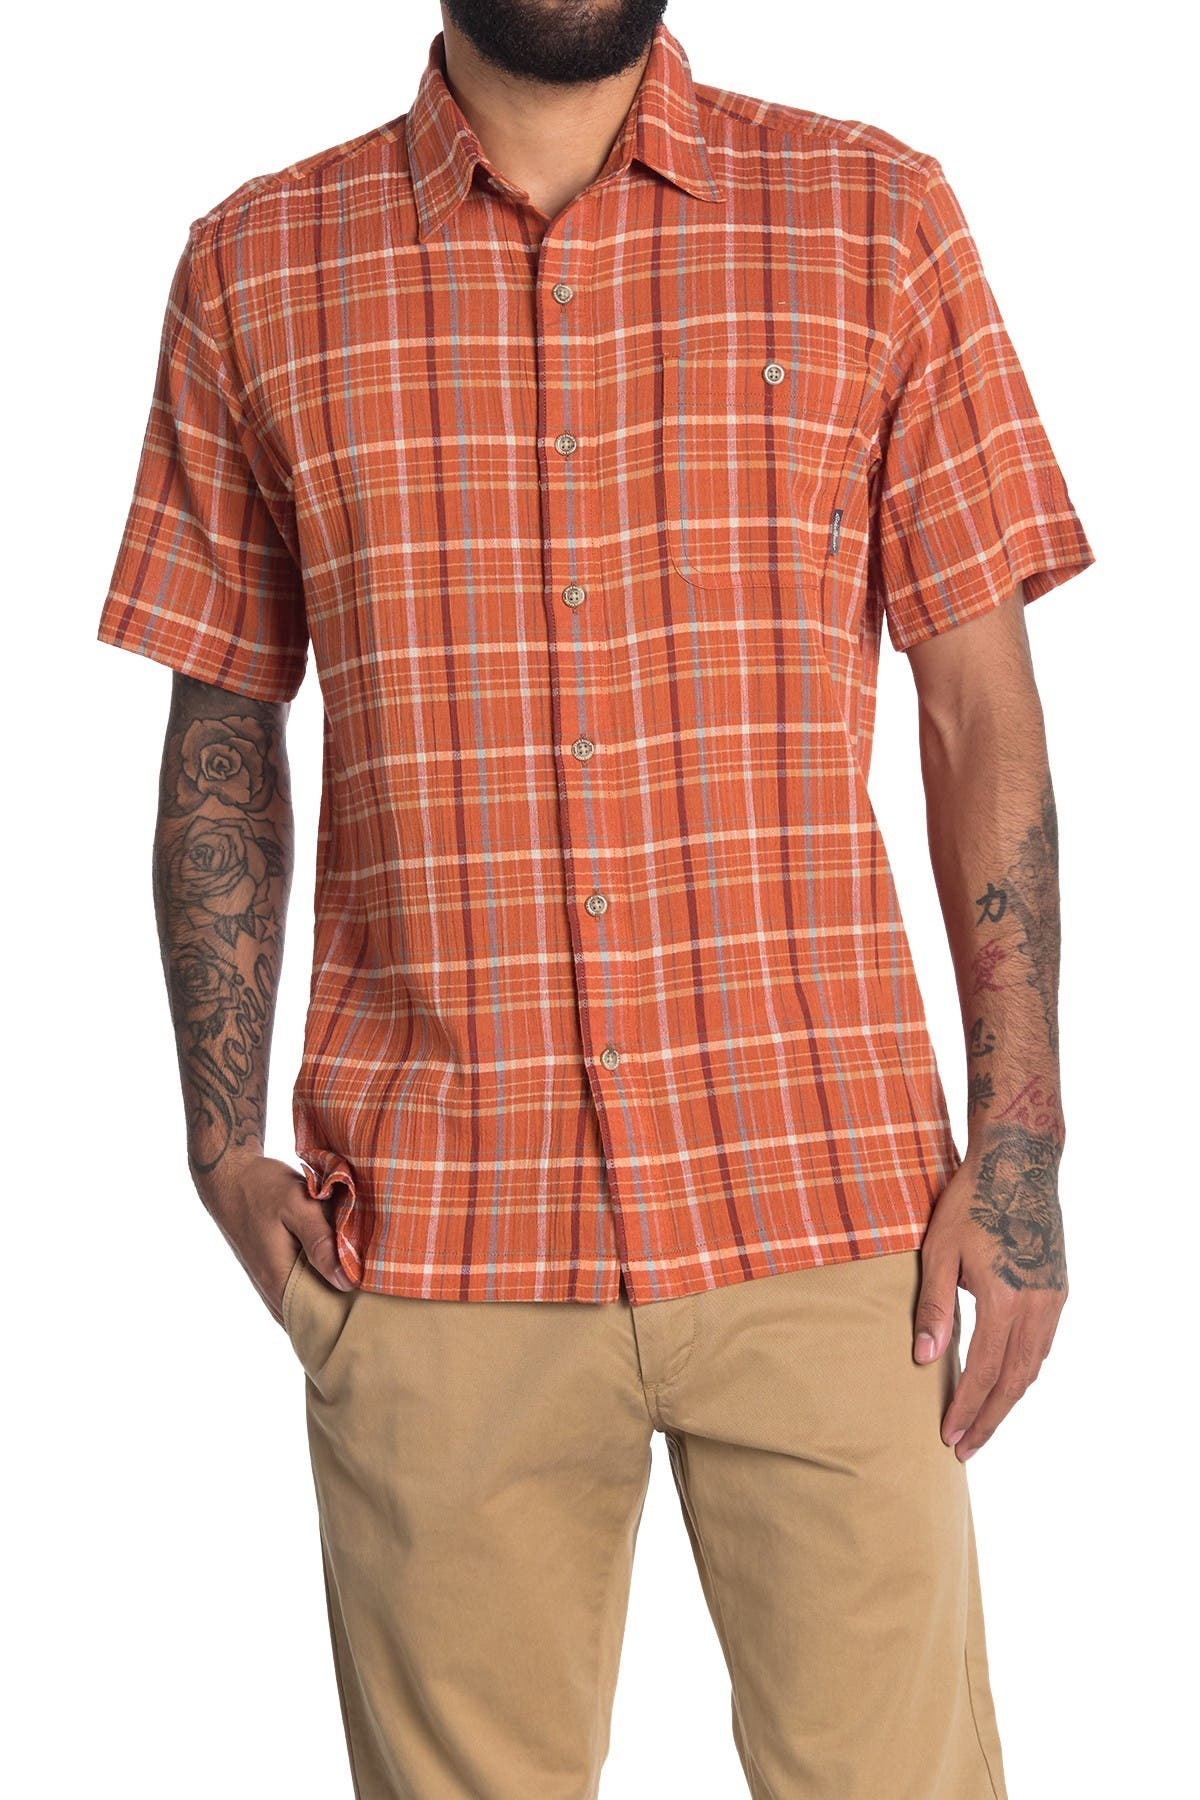 Image of Eddie Bauer Plaid Regular Fit Shirt